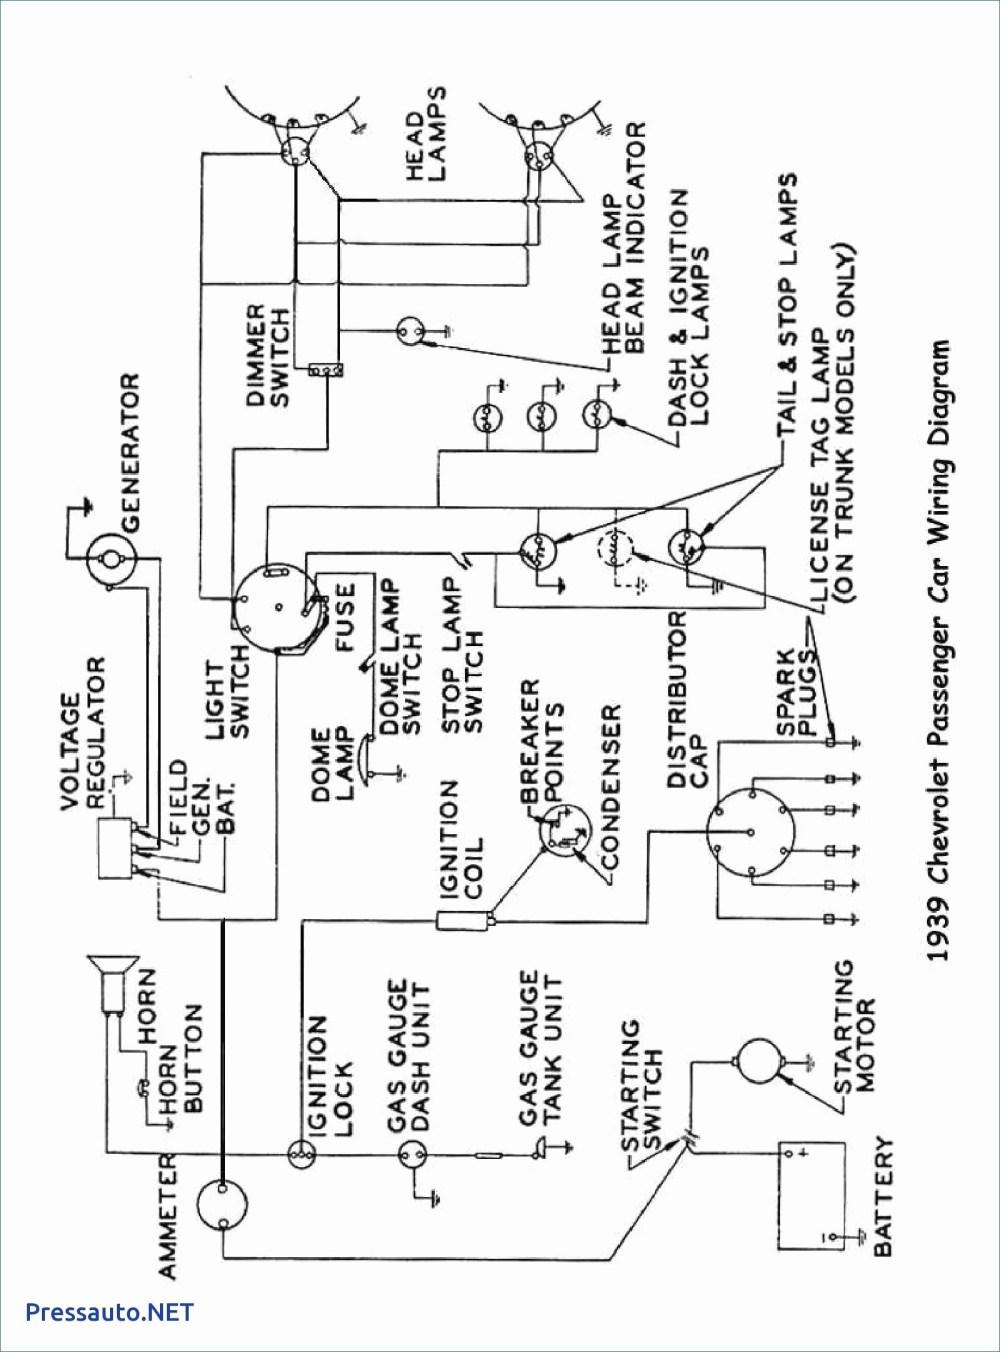 medium resolution of international 4700 wiring diagram headlights wiring library international 4700 wiring diagram pdf